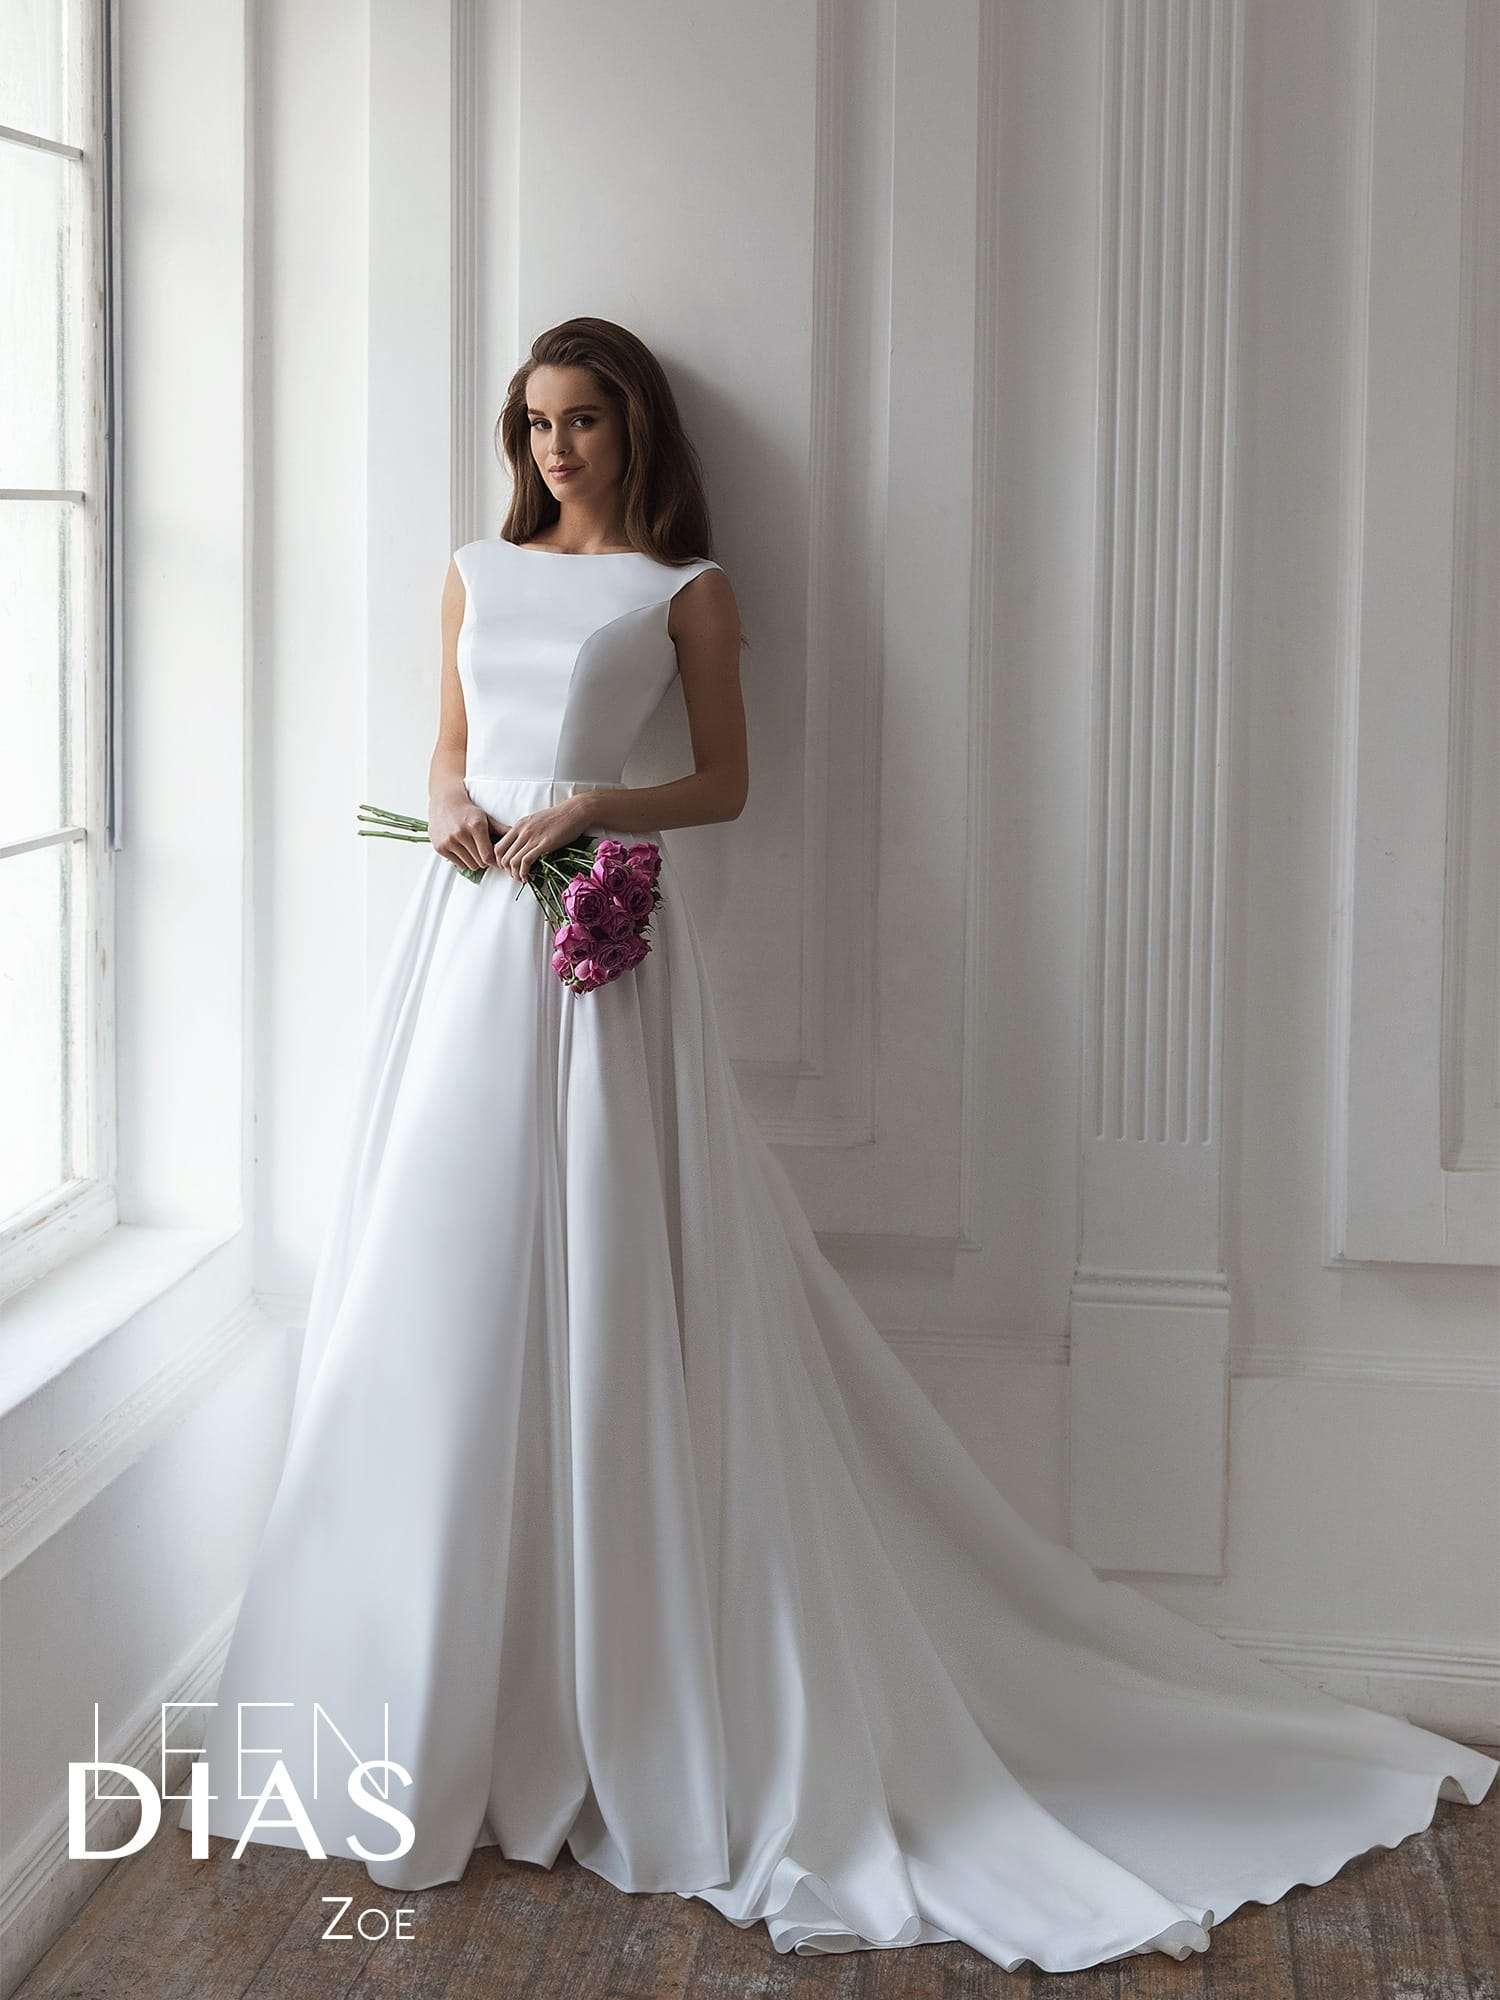 свадебное платье атлосное Zoe-1.1800x1800w